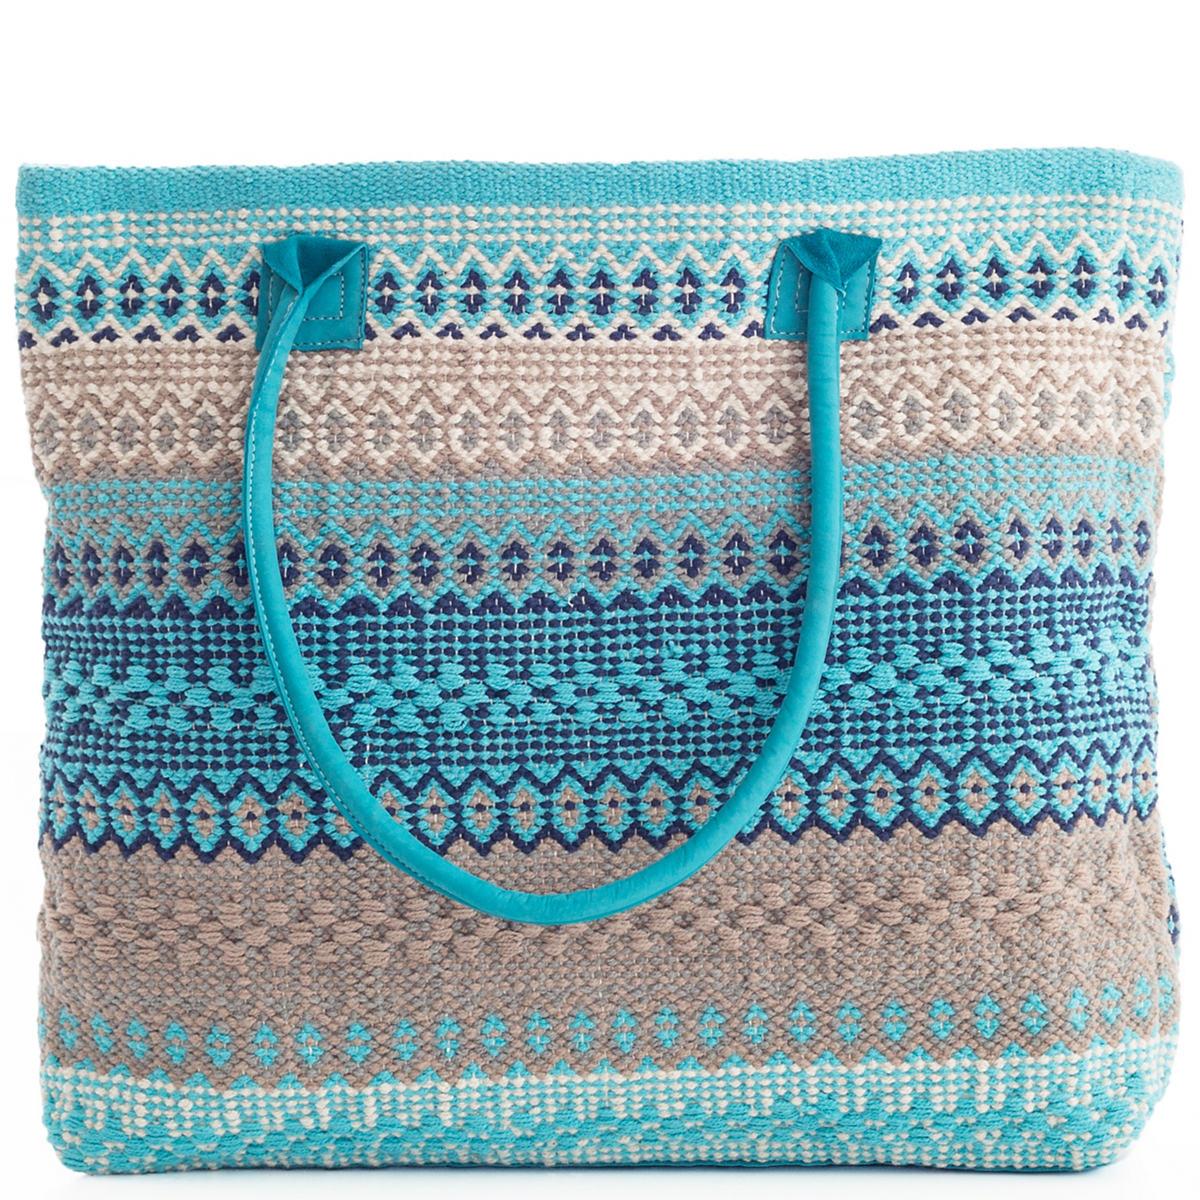 Gypsy Stripe Turquoise Grey Woven Cotton Rug